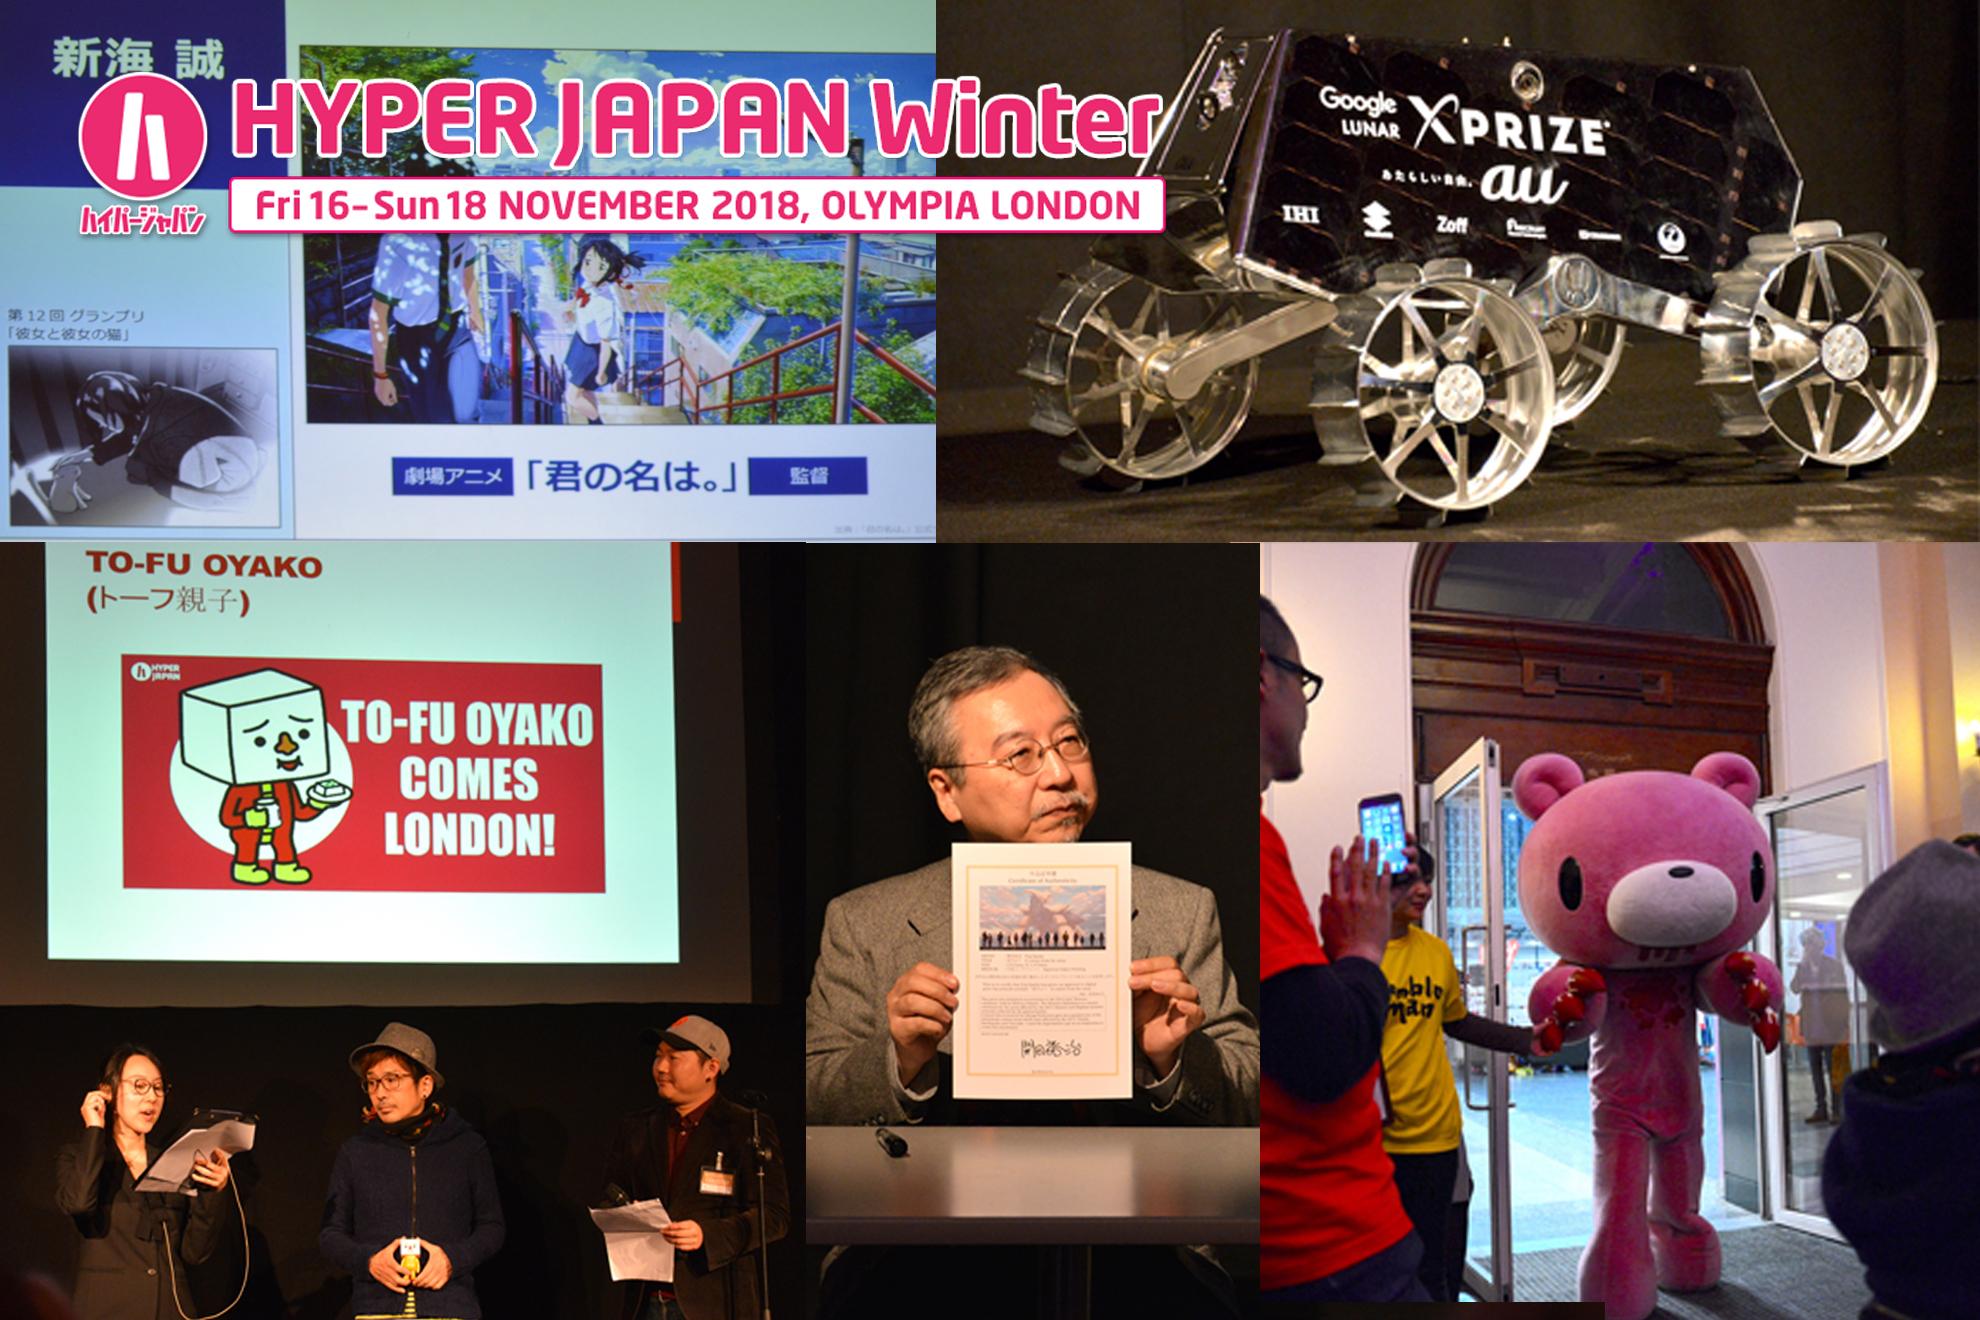 20181122 [HYPER JAPAN] 『HYPER JAPAN 2018 WINTER』 Special Reports ①